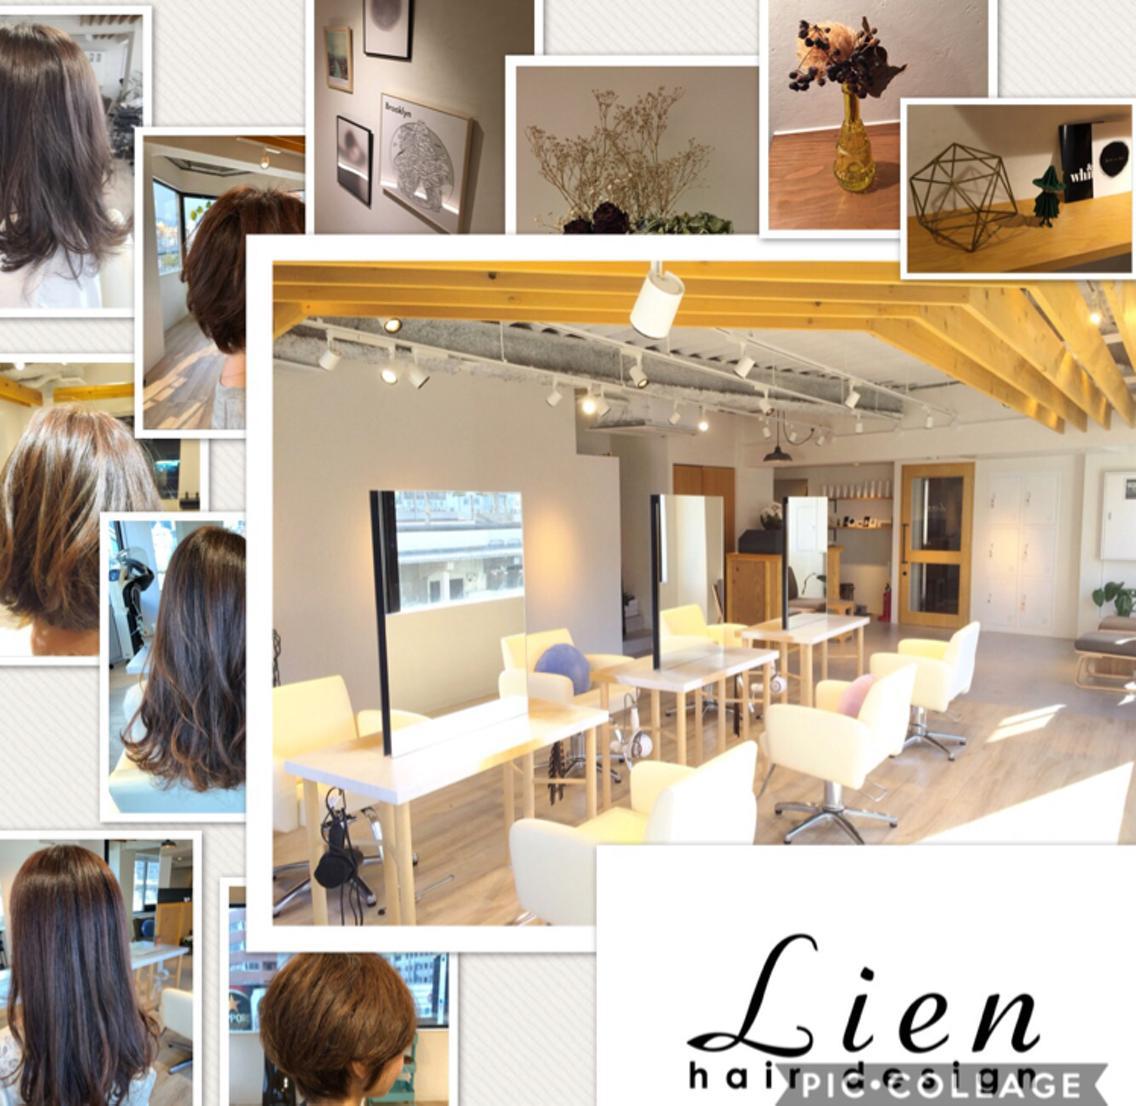 hair design Lien所属・hair desi gnLienの掲載